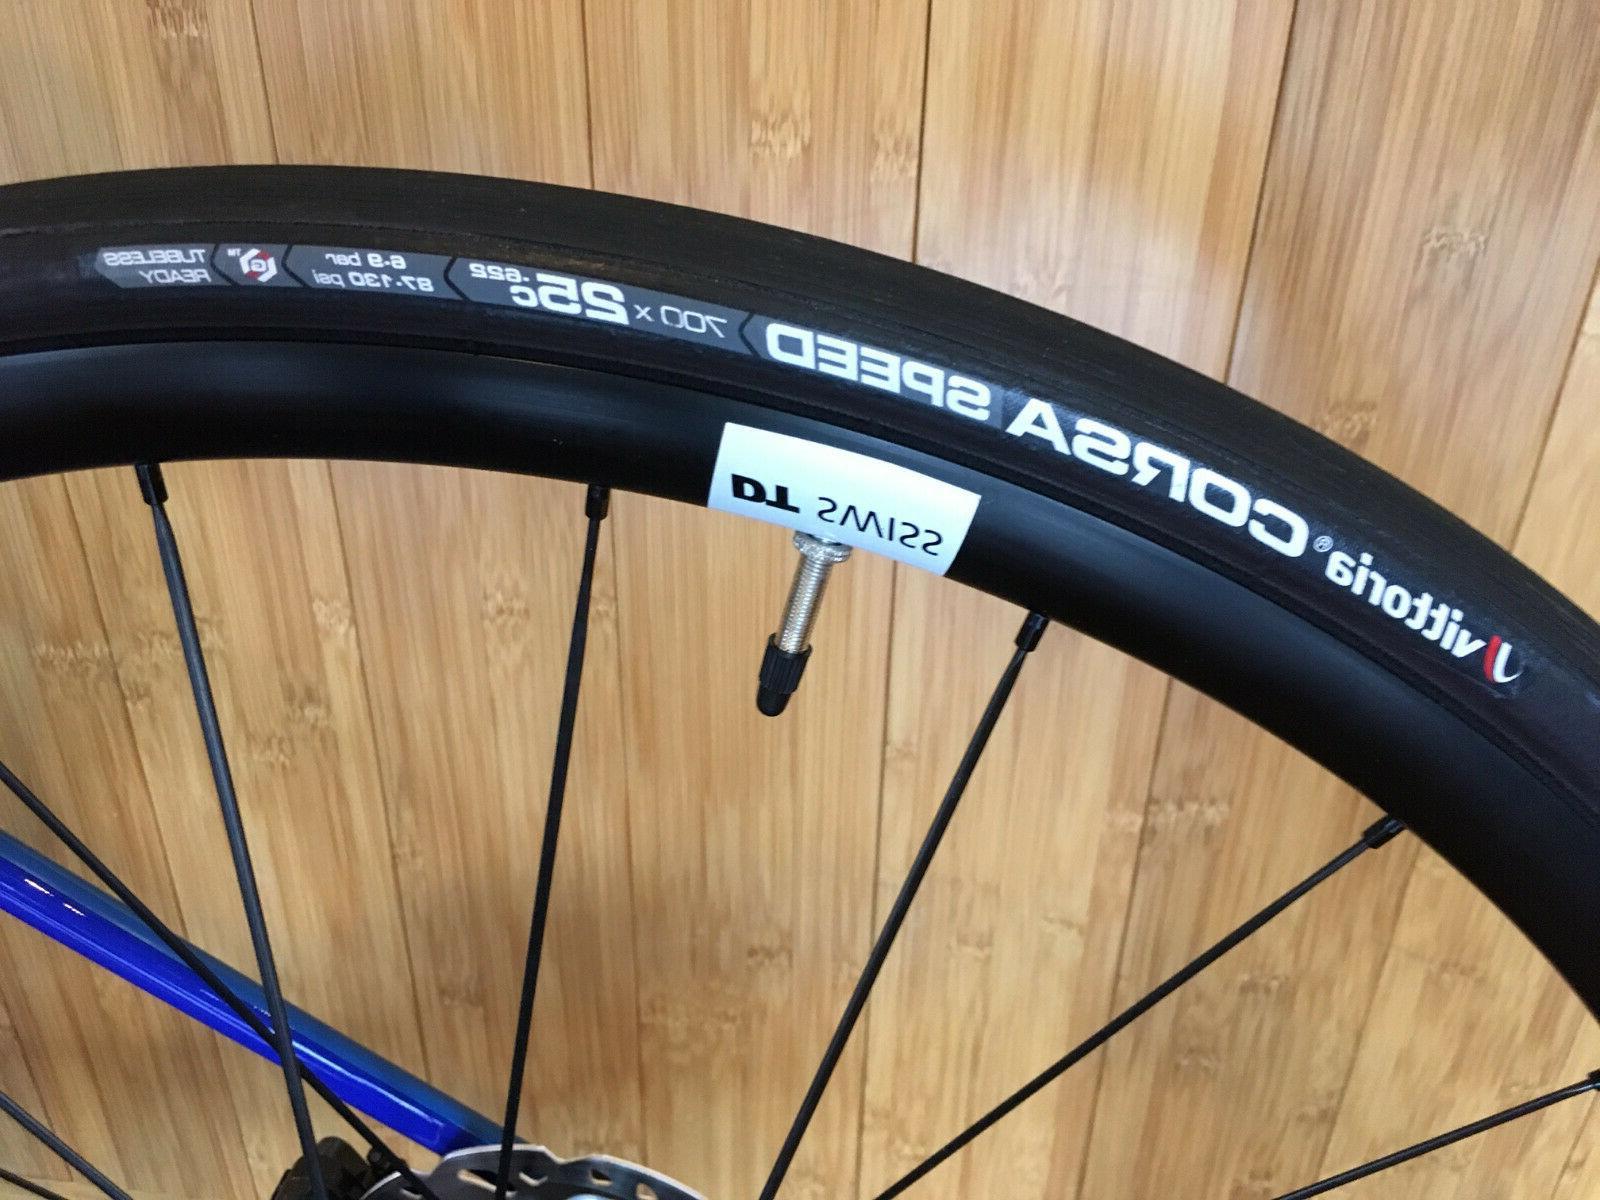 Parlee Road Bike 8000 Demo Many Upgrades